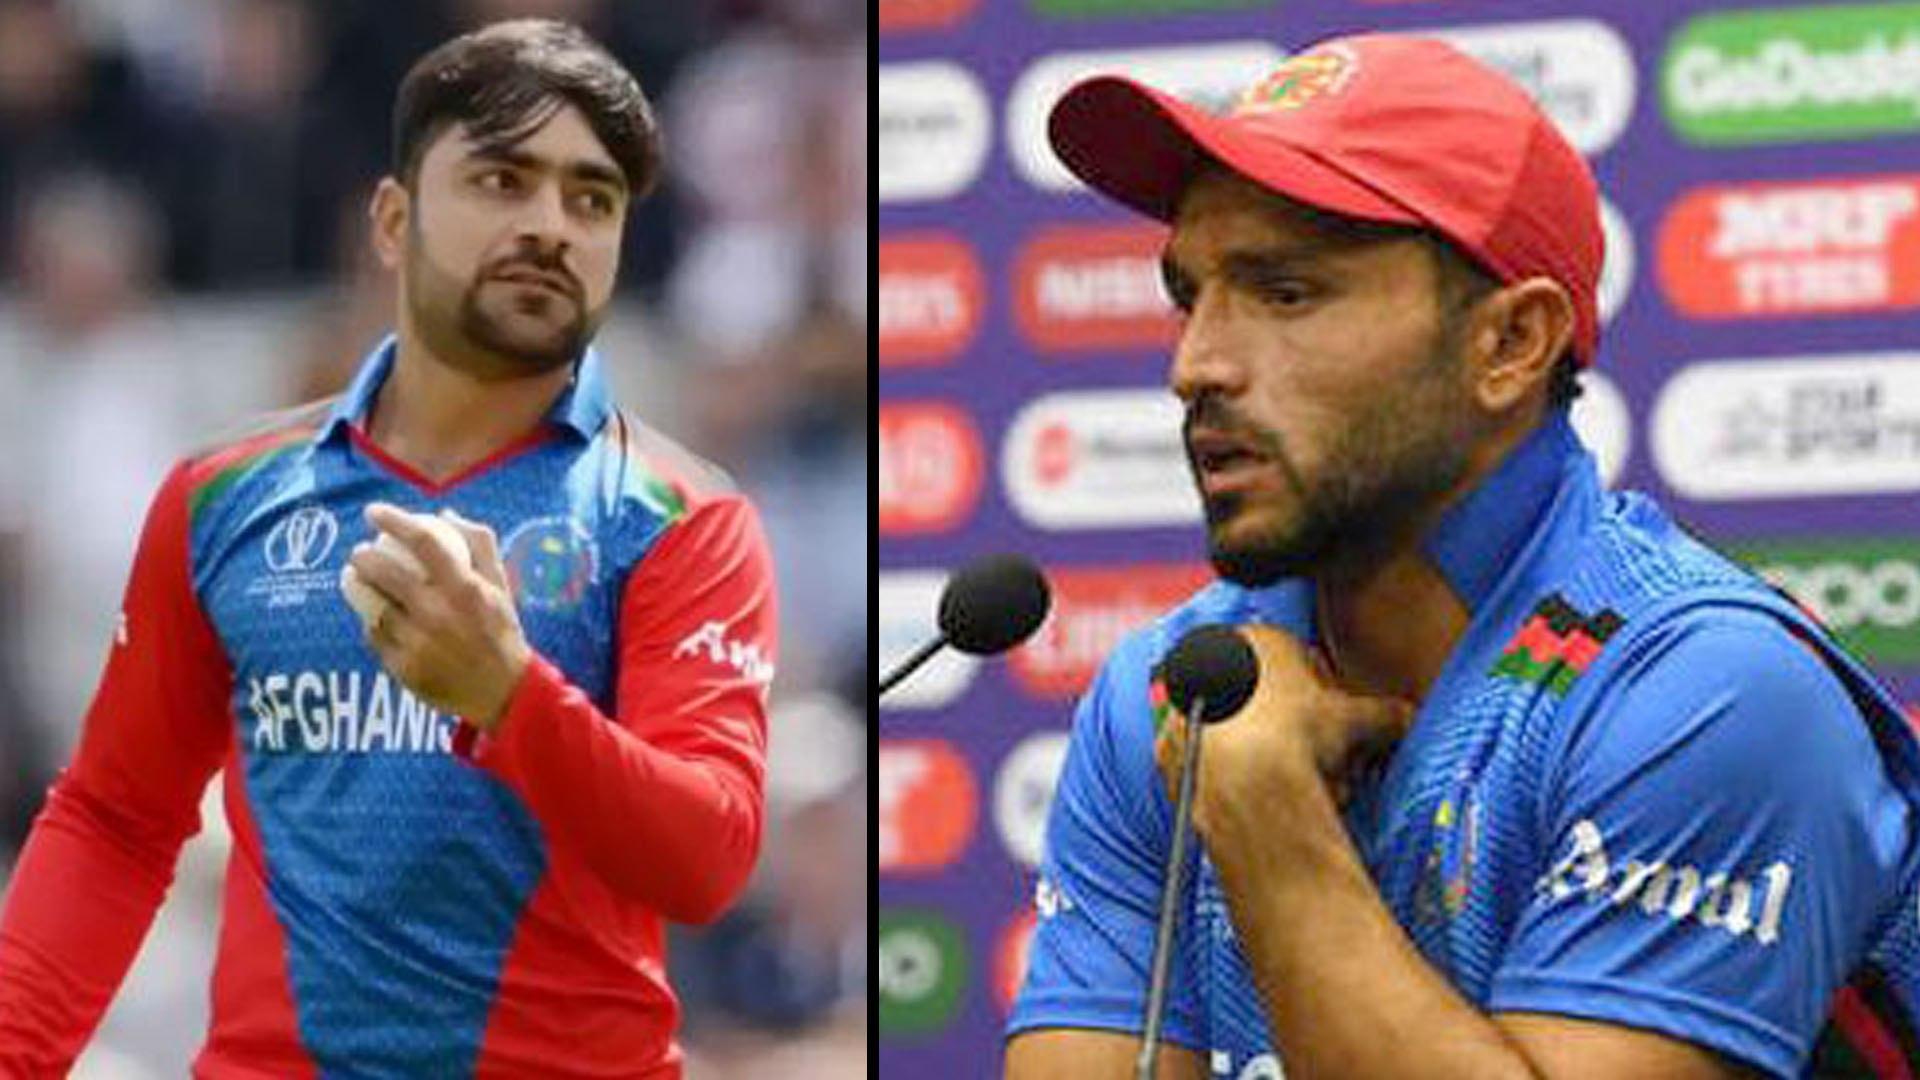 ICC Cricket World Cup 2019 : Gulbadin Naib Defends Rashid Khan After England Assault || Oneindia